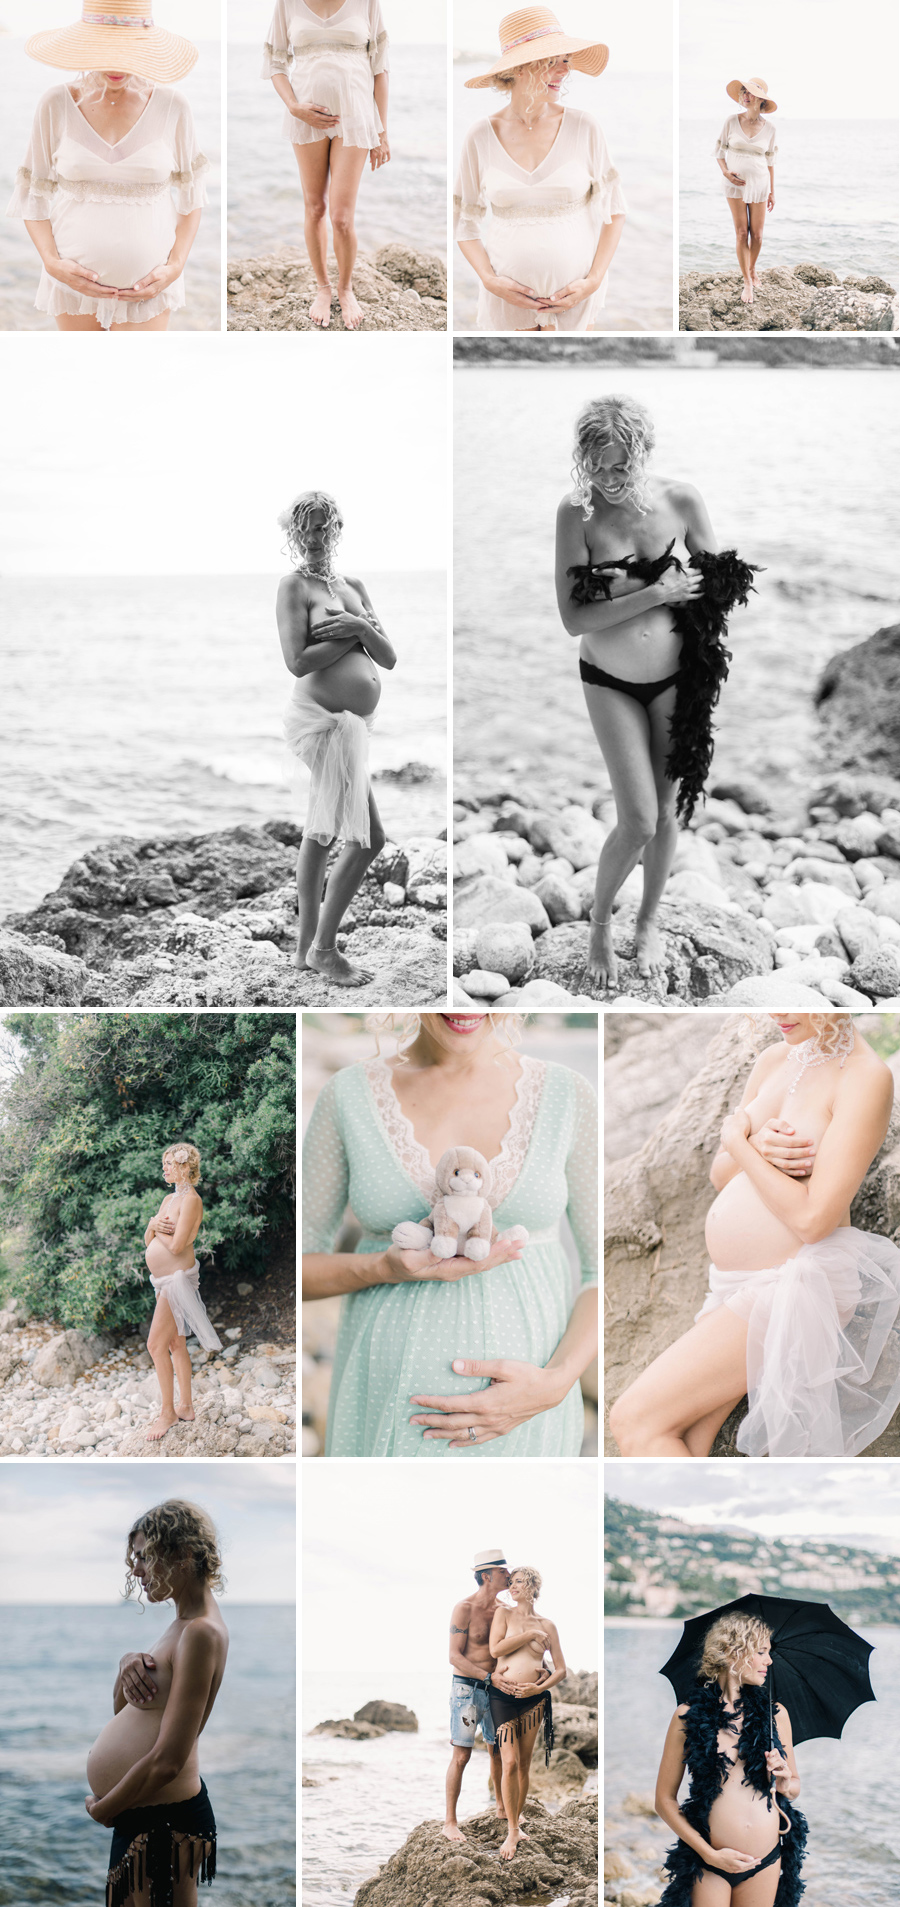 seance grossesse monaco photographe maternity montecarlo